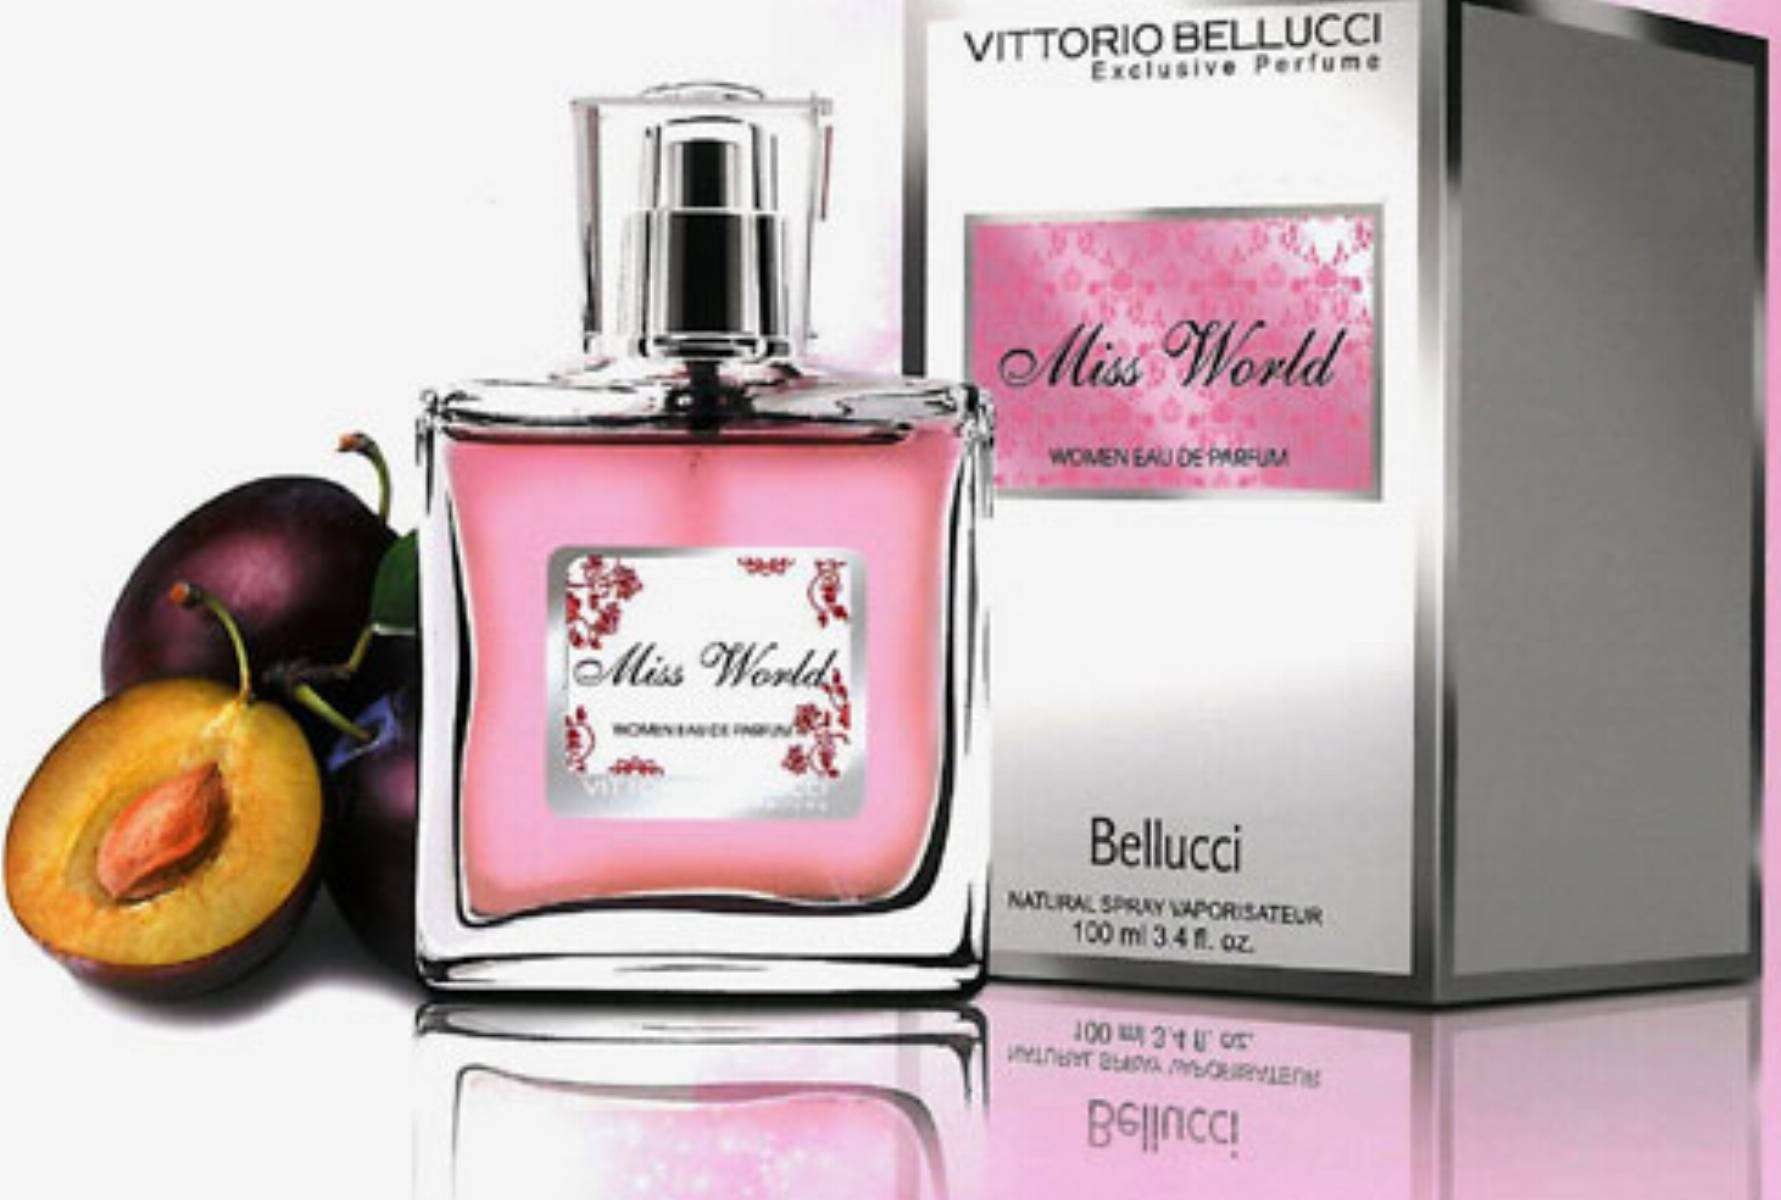 Vittorio Bellucci MISS WORLD